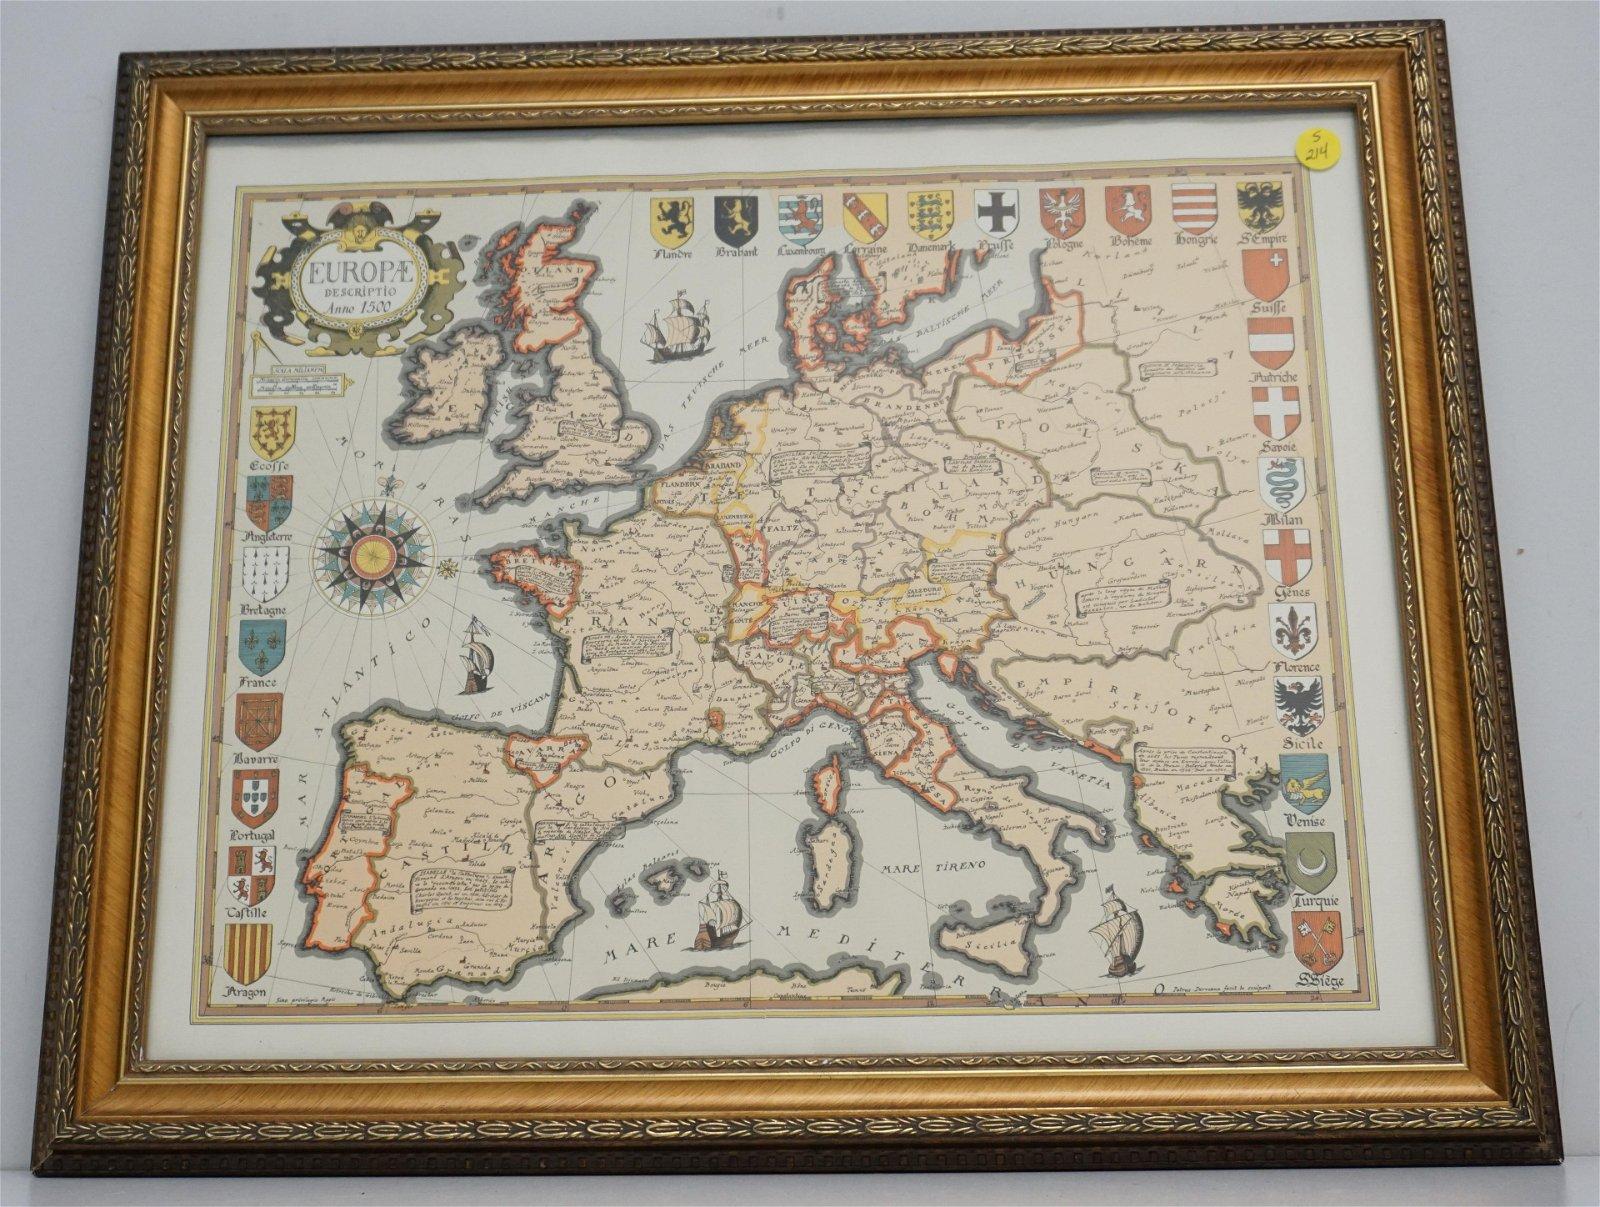 MAP OF EUROPE PRINT FRAMED